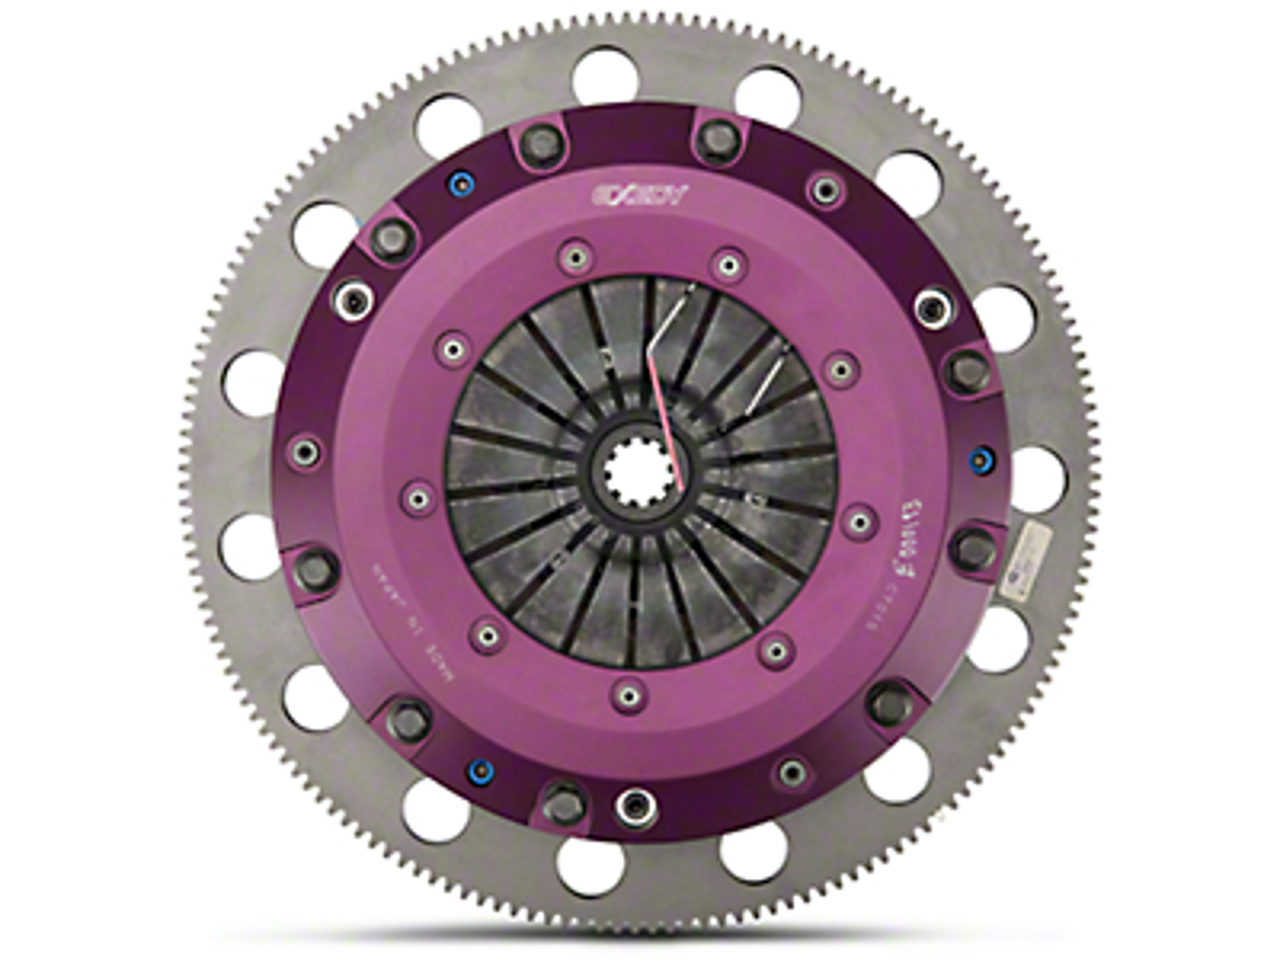 Exedy Hyper Clutch Kit - Twin Disc w/ Flywheel (99-Mid 01 GT; 96-04 Cobra, Mach 1)